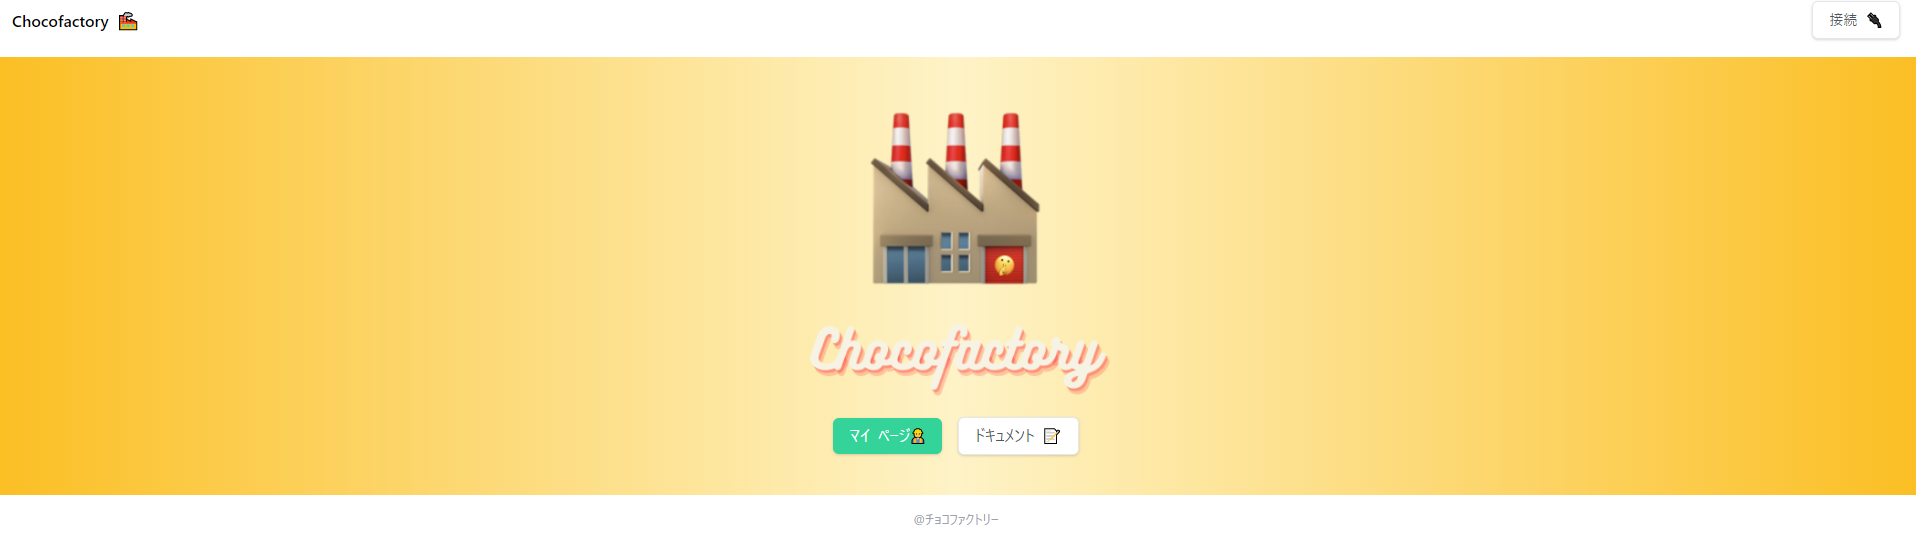 【Chocofactory】の始め方